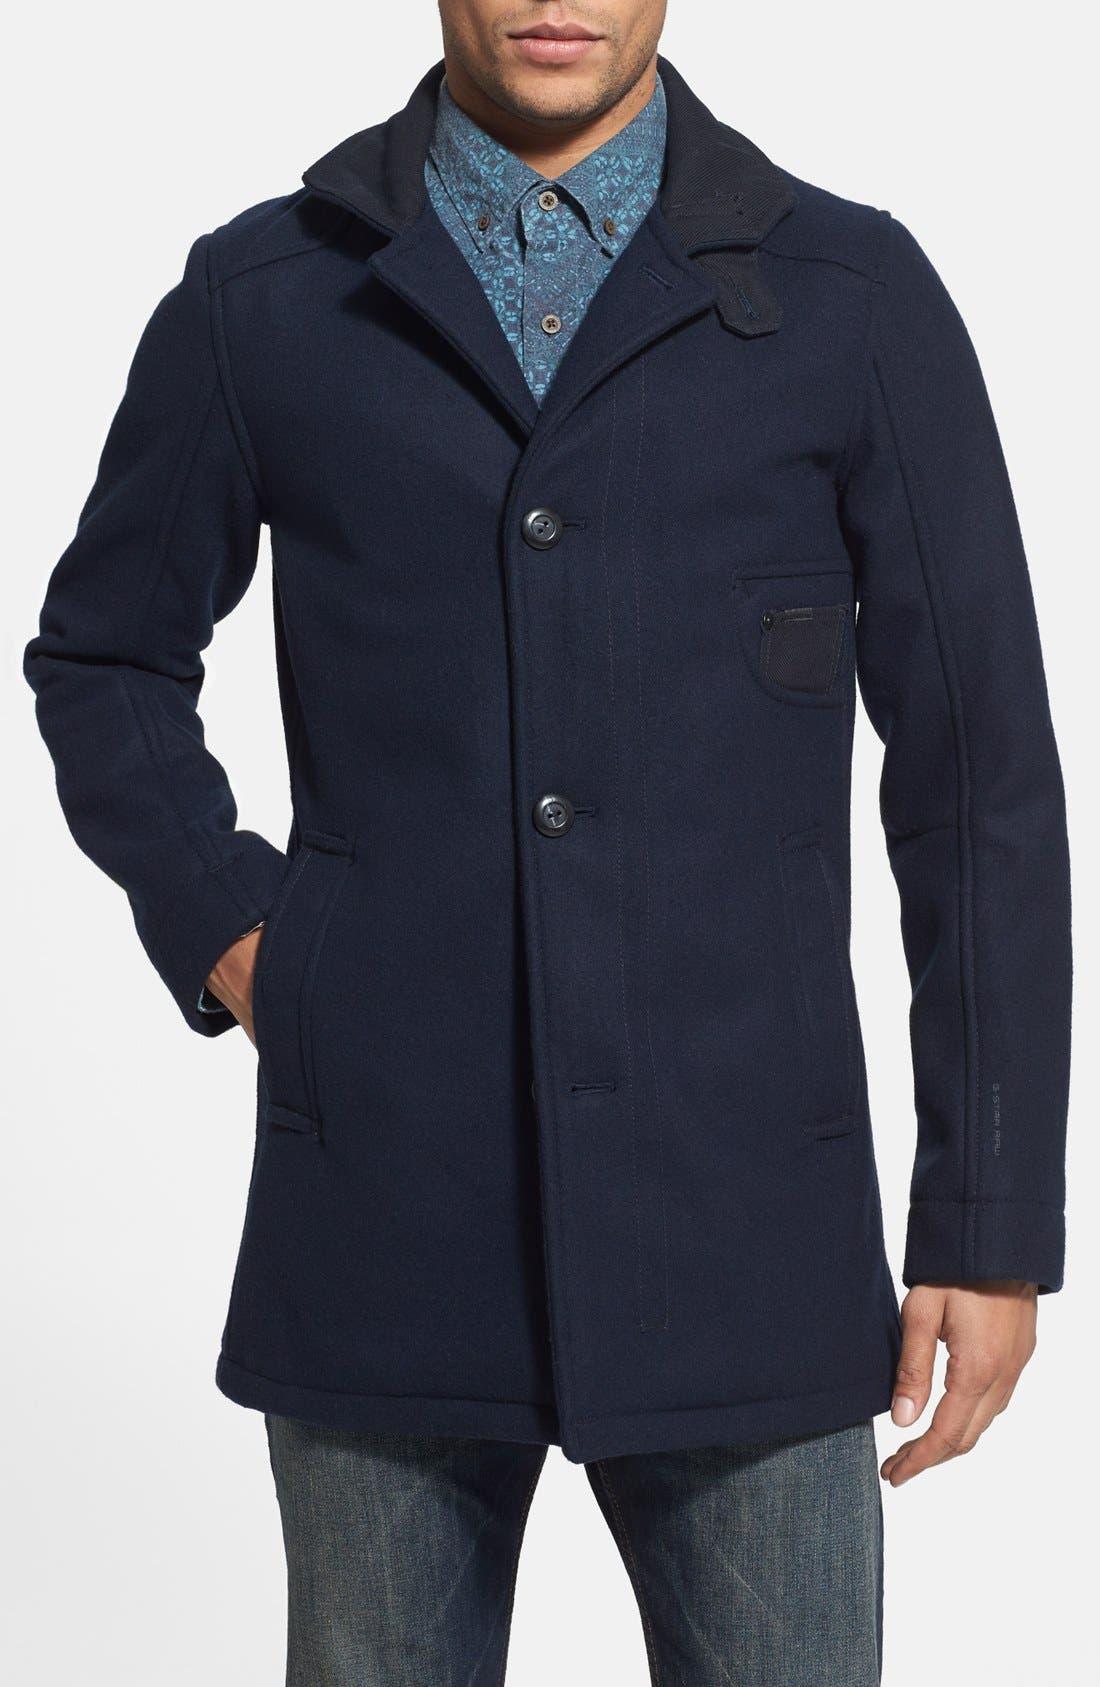 'Radar Garber' Wool Blend Jacket,                             Main thumbnail 1, color,                             400